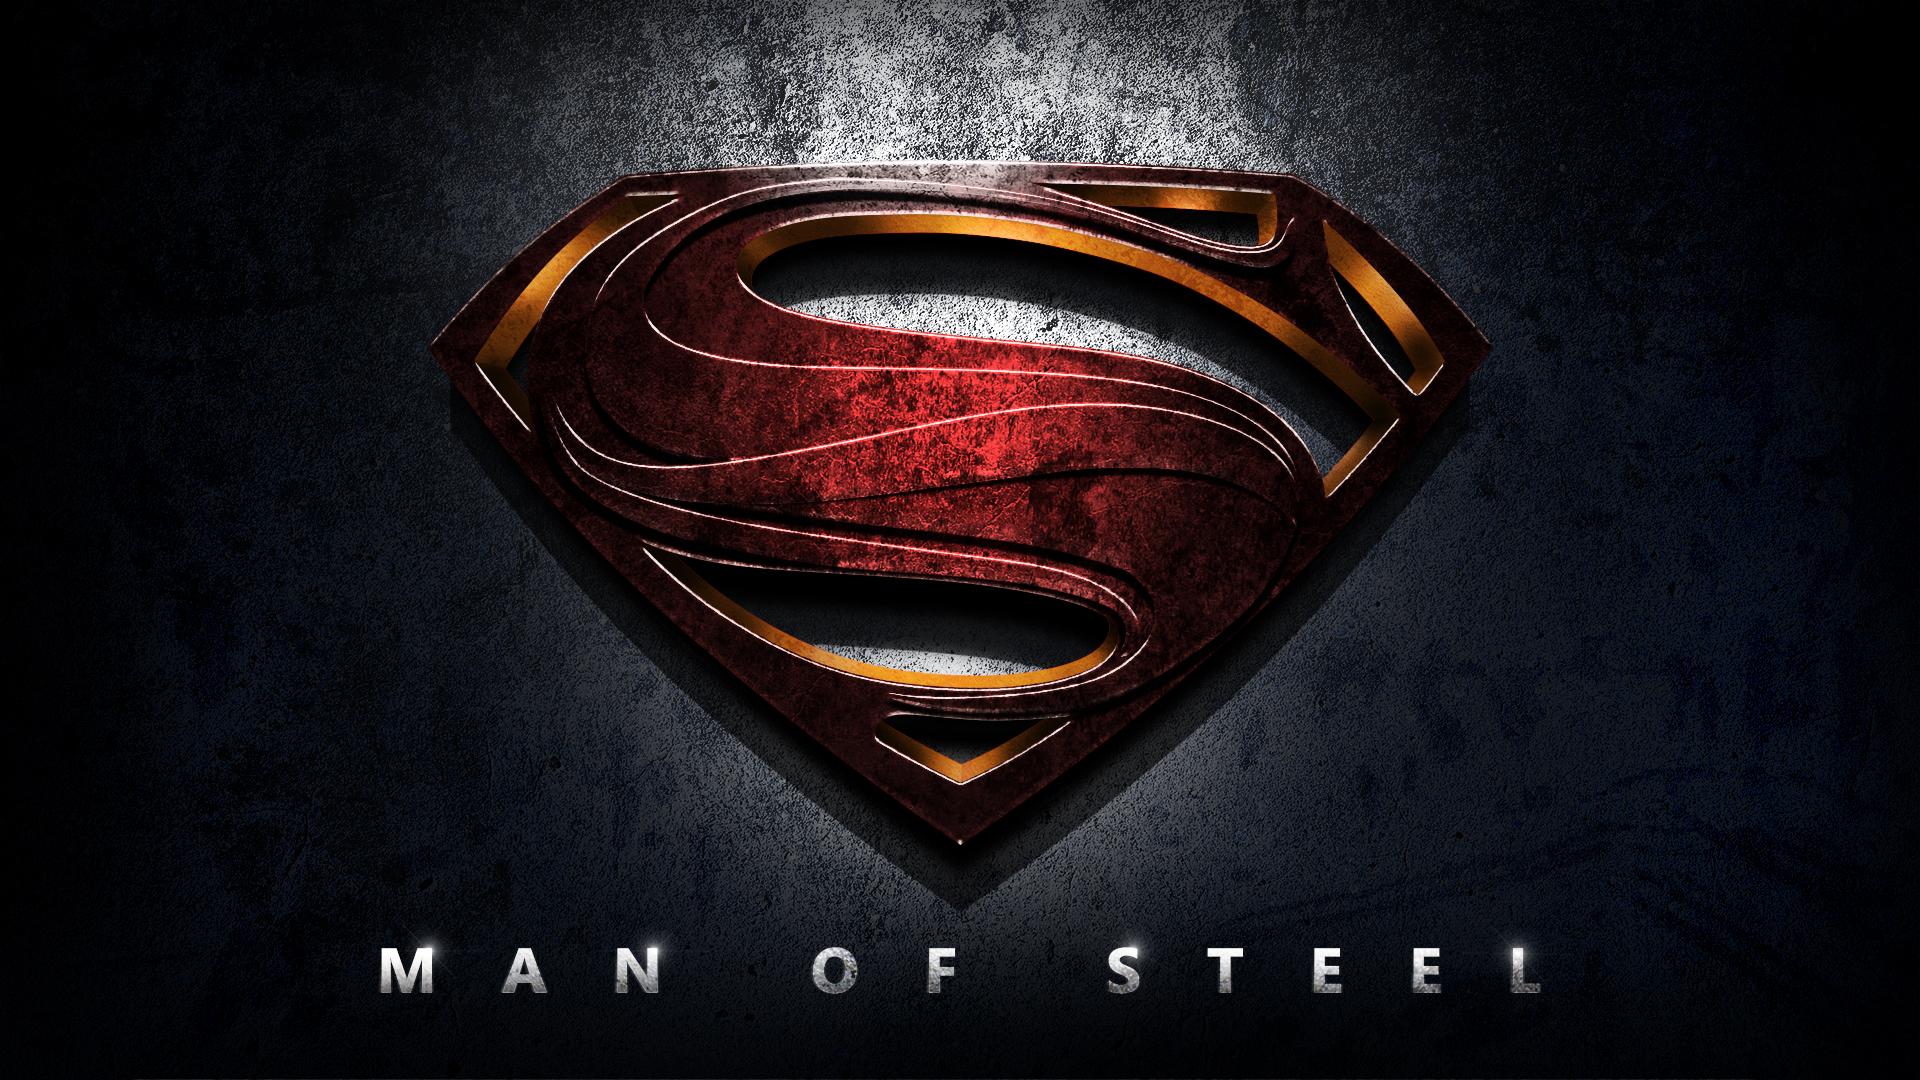 man of steel full movie free download